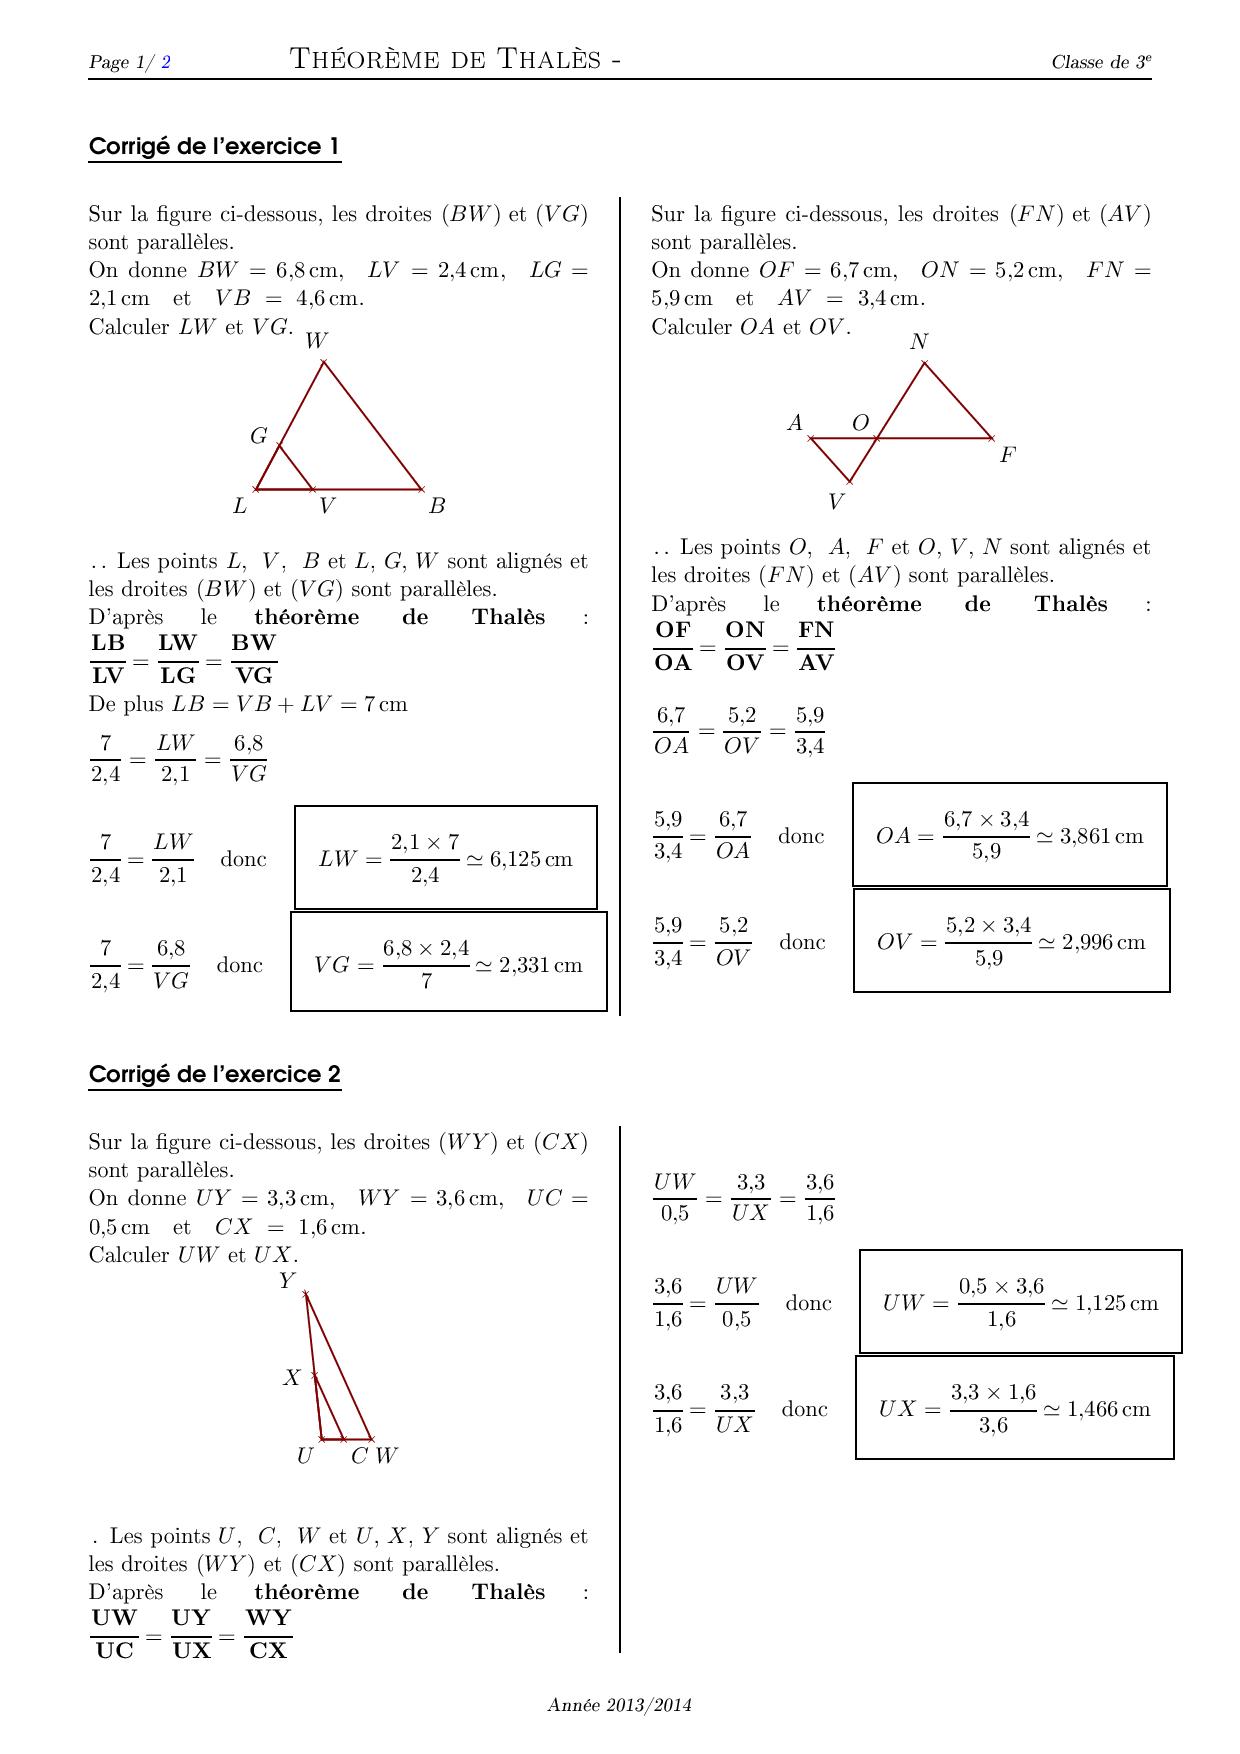 Theoreme De Thales Corrige Serie D Exercices 2 Alloschool